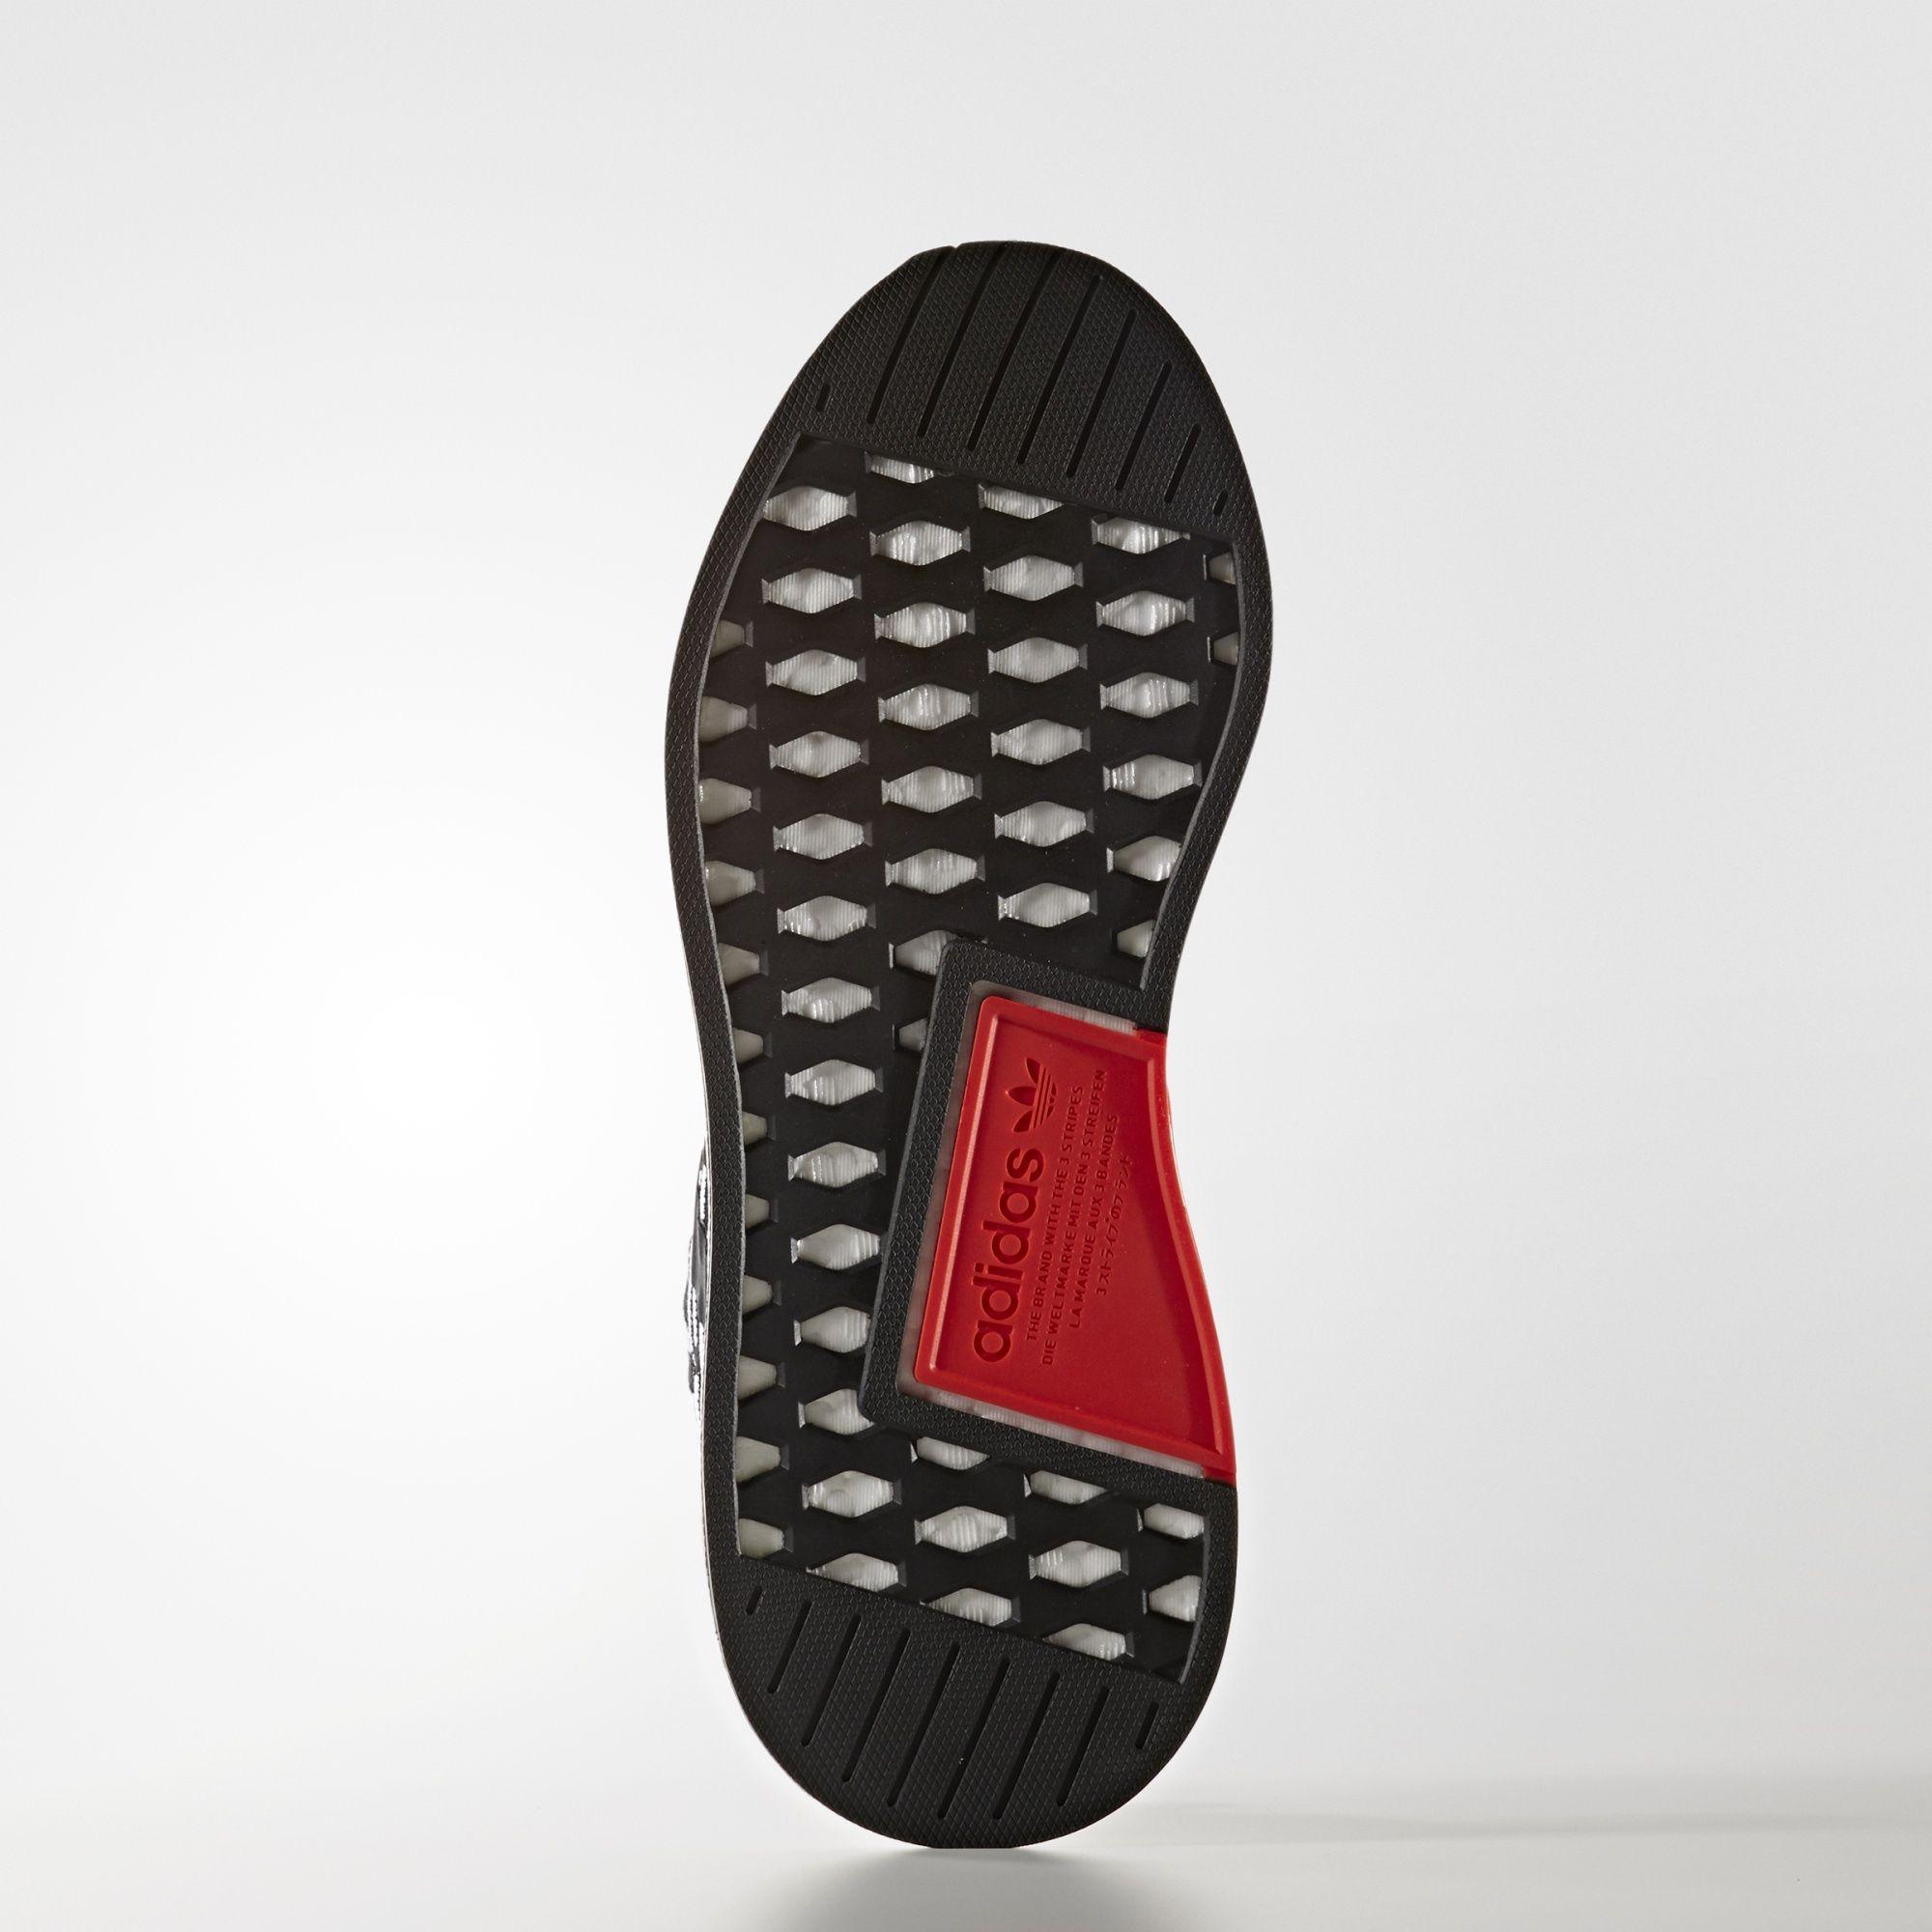 adidas nmd r2 primeknit Zebra BB2951 2